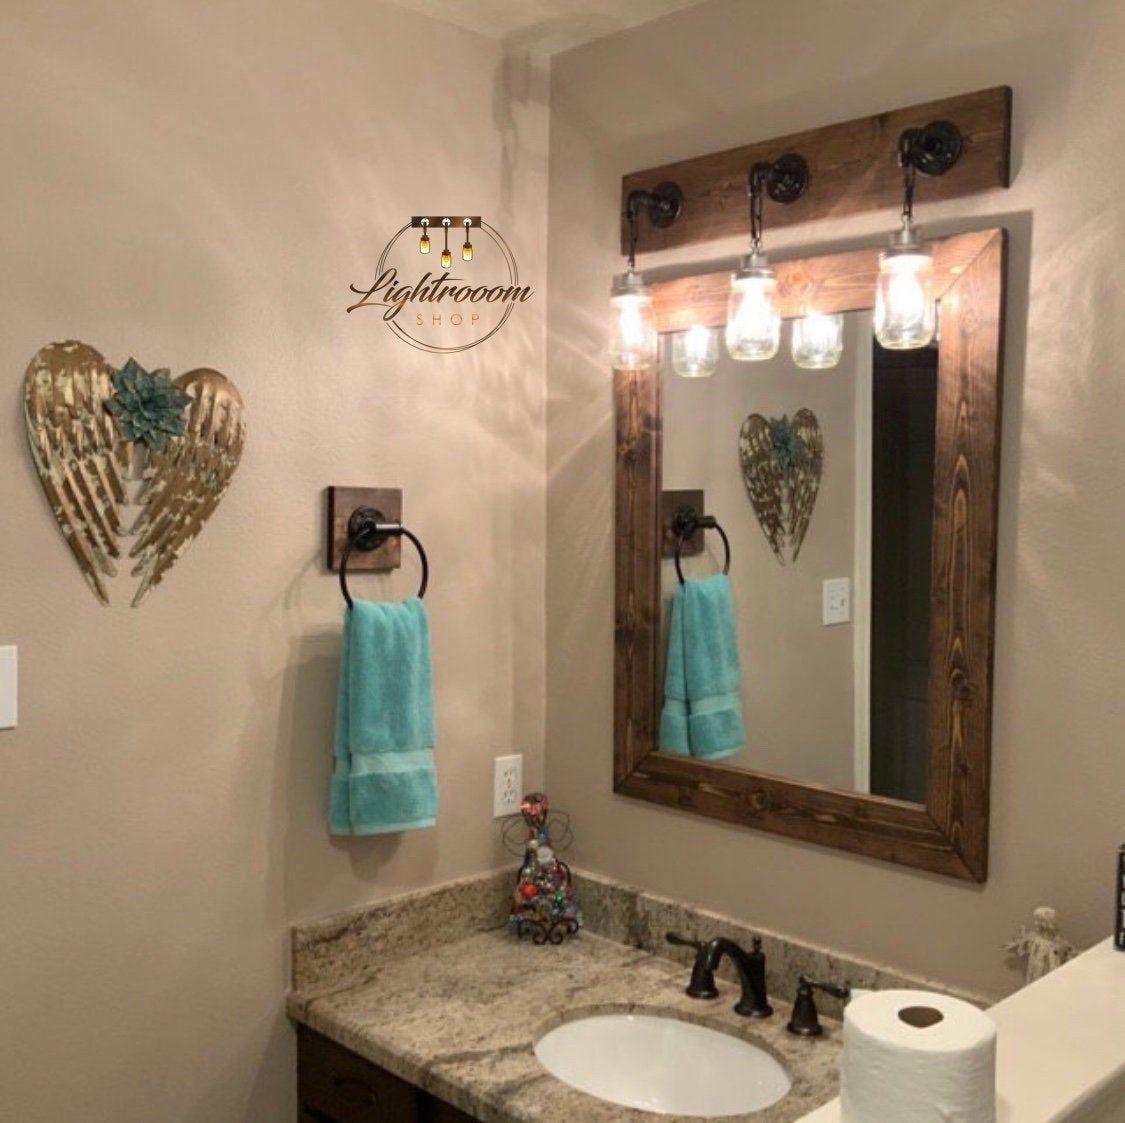 Dark Walnut Farmhouse Mirror Country Wood Frame Mirror Wood Mirror Bathroom Mirror Wall Mirror Vanity Mirrors Cottage Large Mirror Vanity Light Fixtures Mason Jar Light Fixture Rustic Bathroom Decor